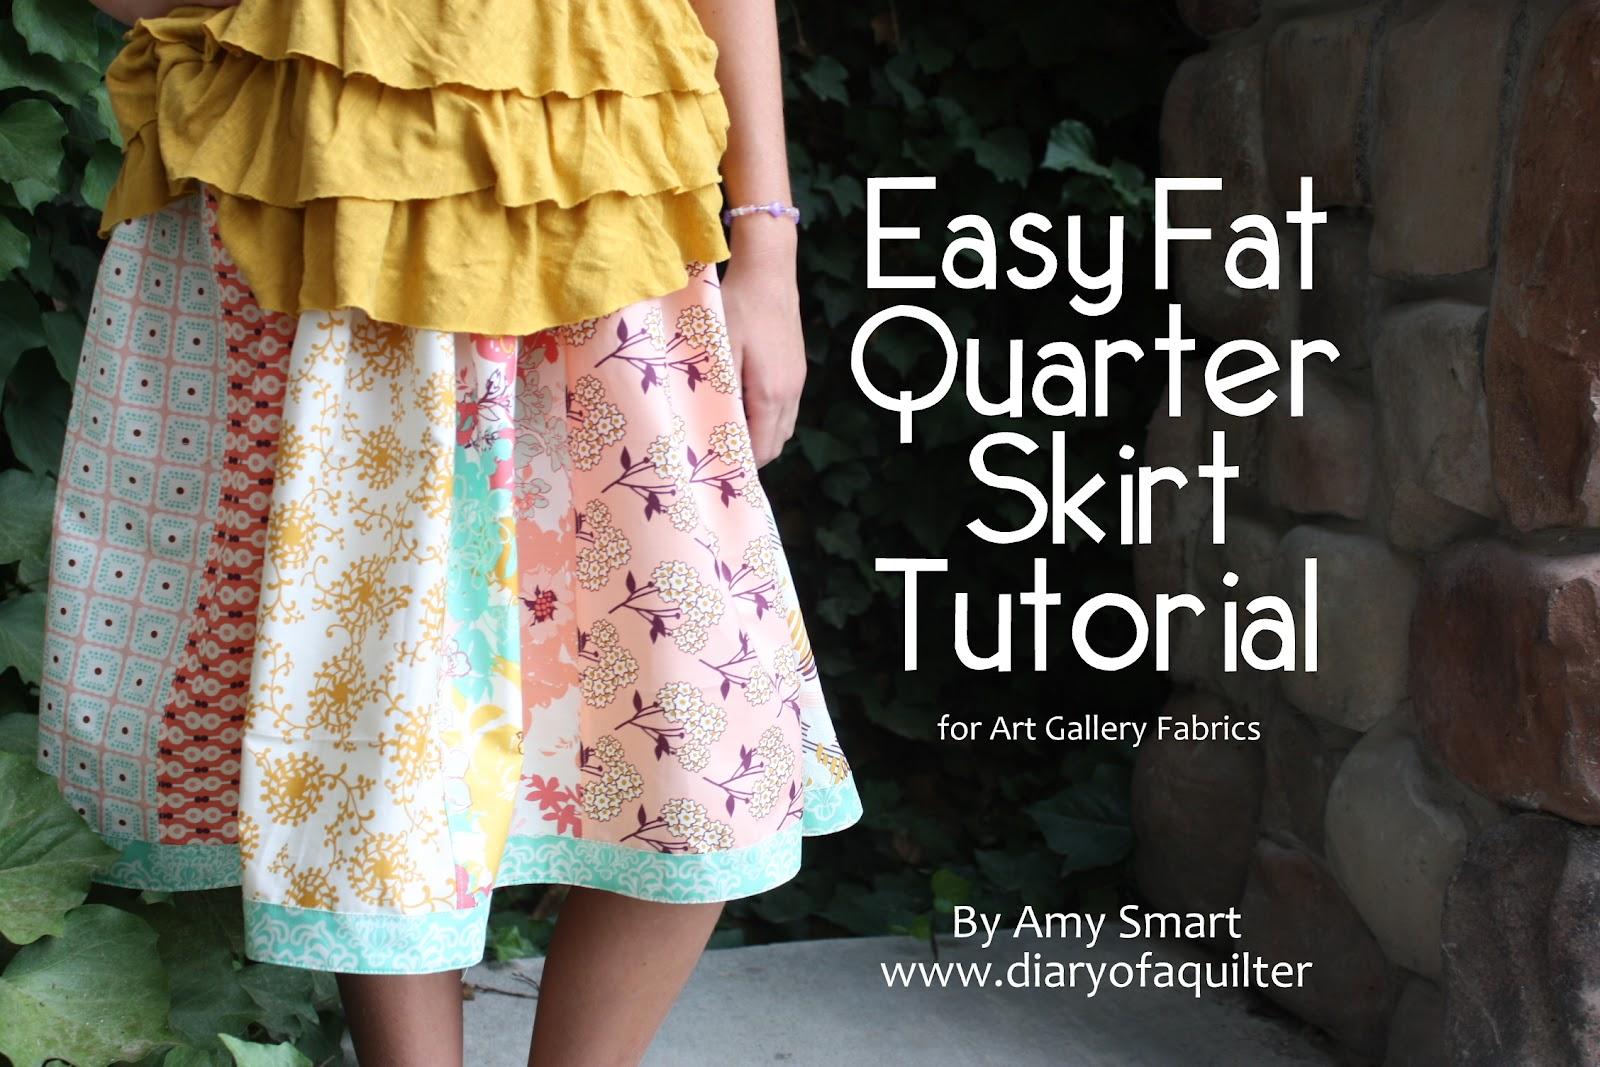 Fat quarter gang easy fq skirt tutorial by diary of a quilter afgeasyfatquarterskirttutorialg baditri Choice Image